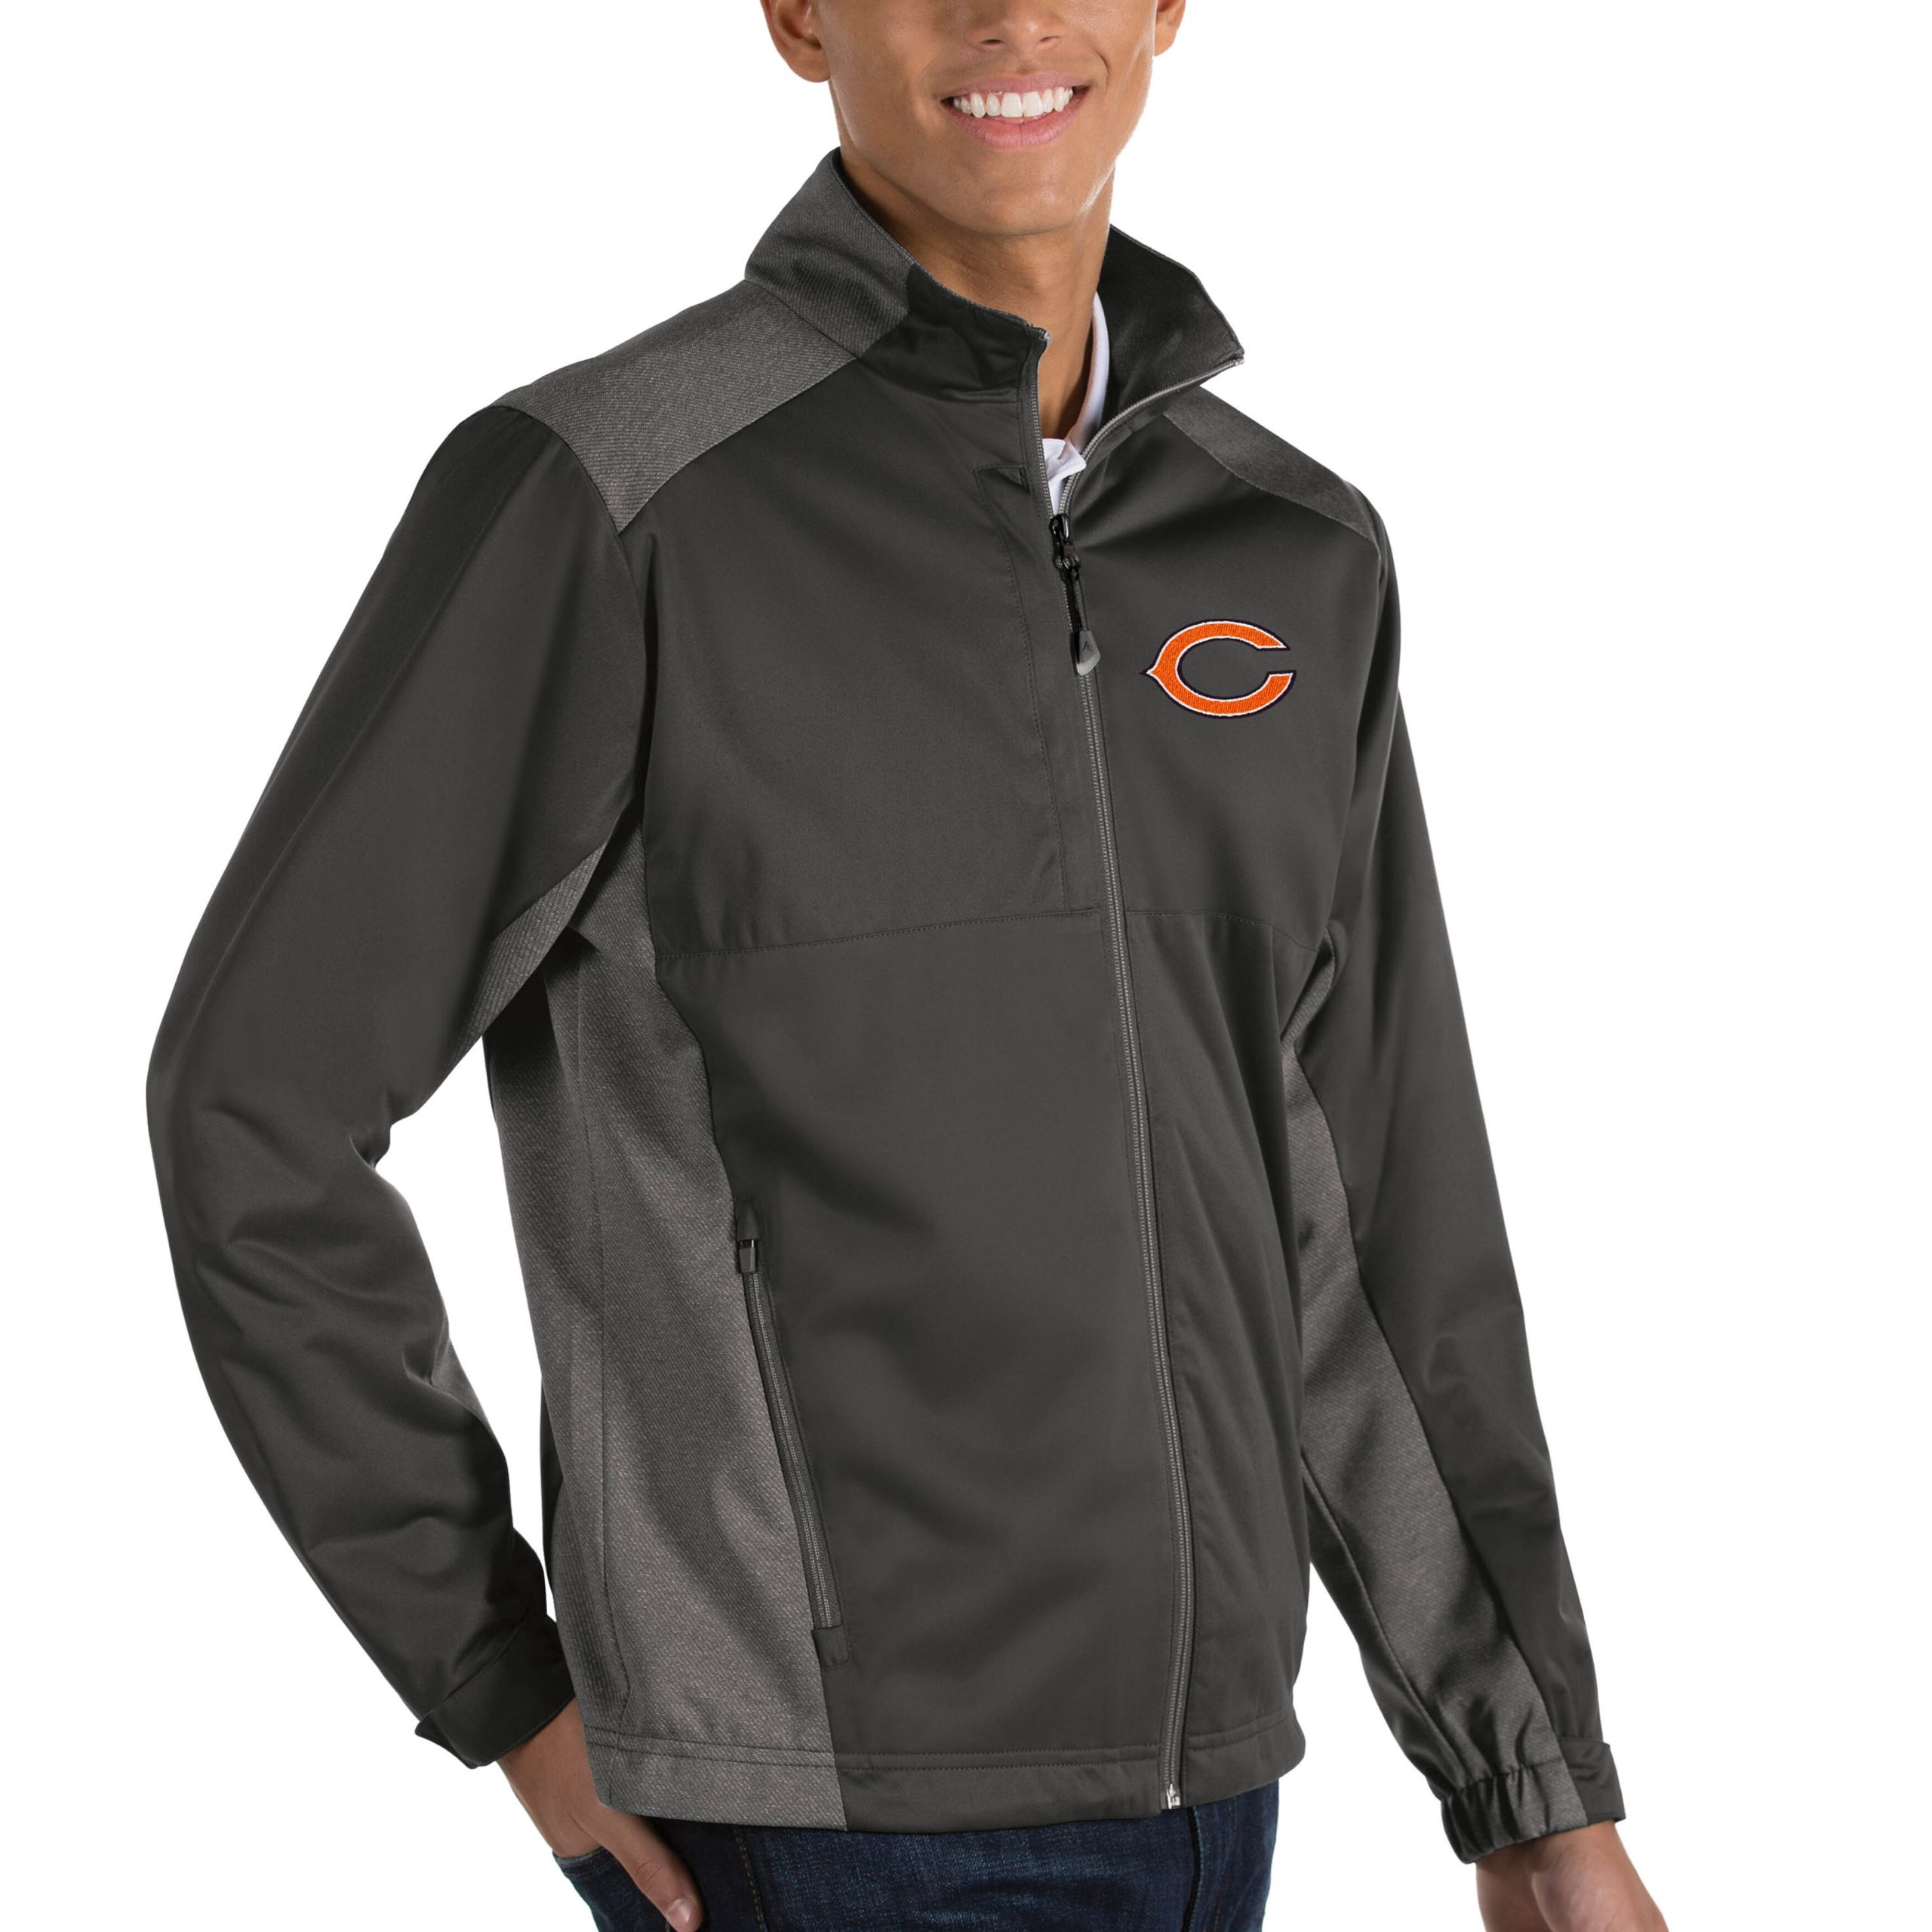 Chicago Bears Antigua Revolve Big & Tall Full-Zip Jacket - Heather Charcoal